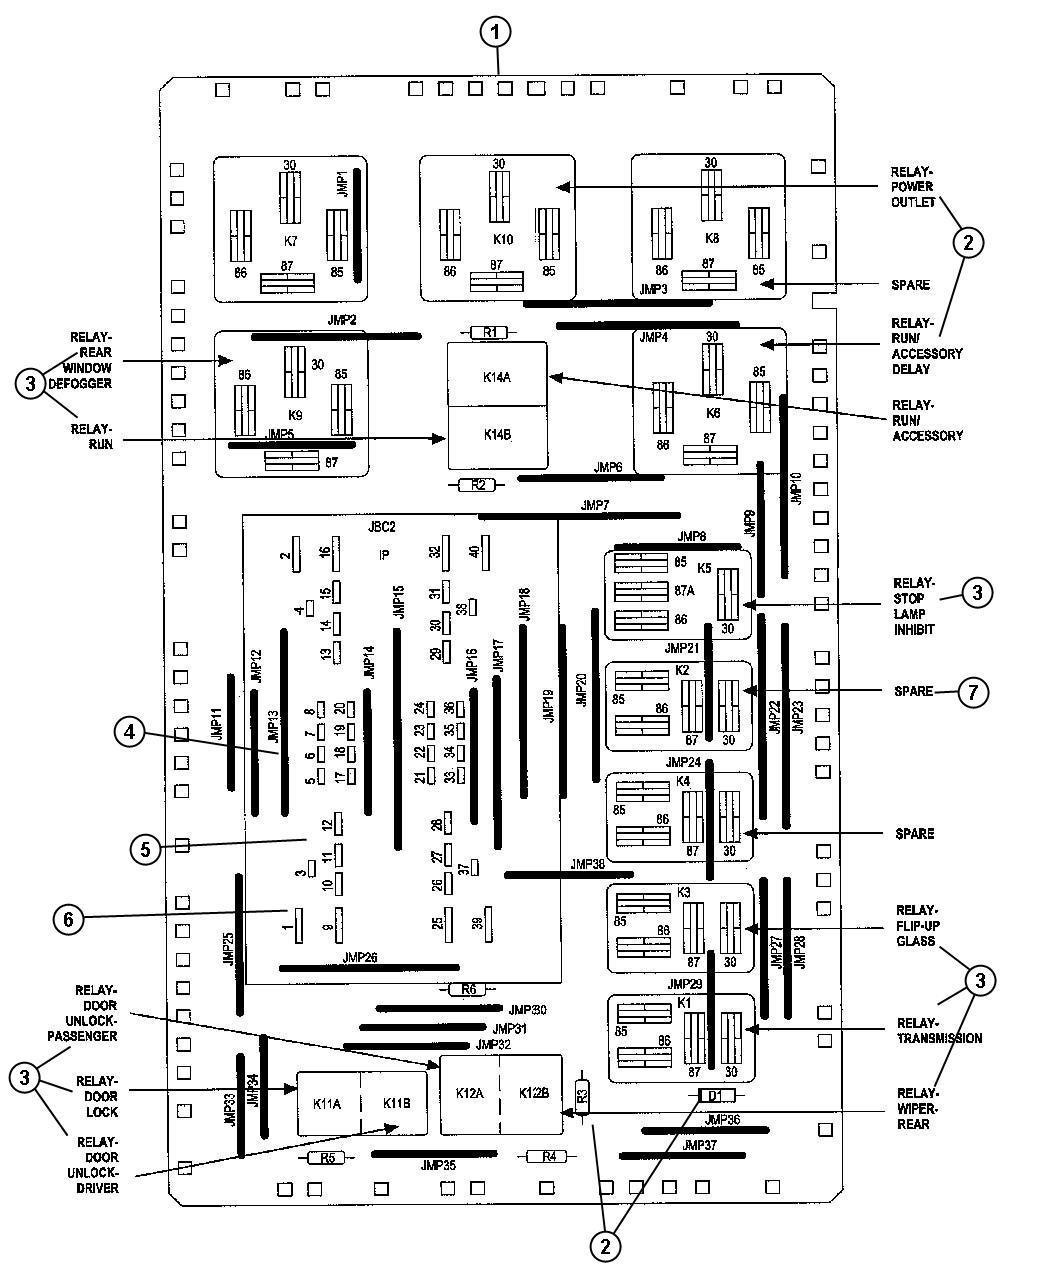 Junction Block Fuses, Relays, and Circuit Breakers